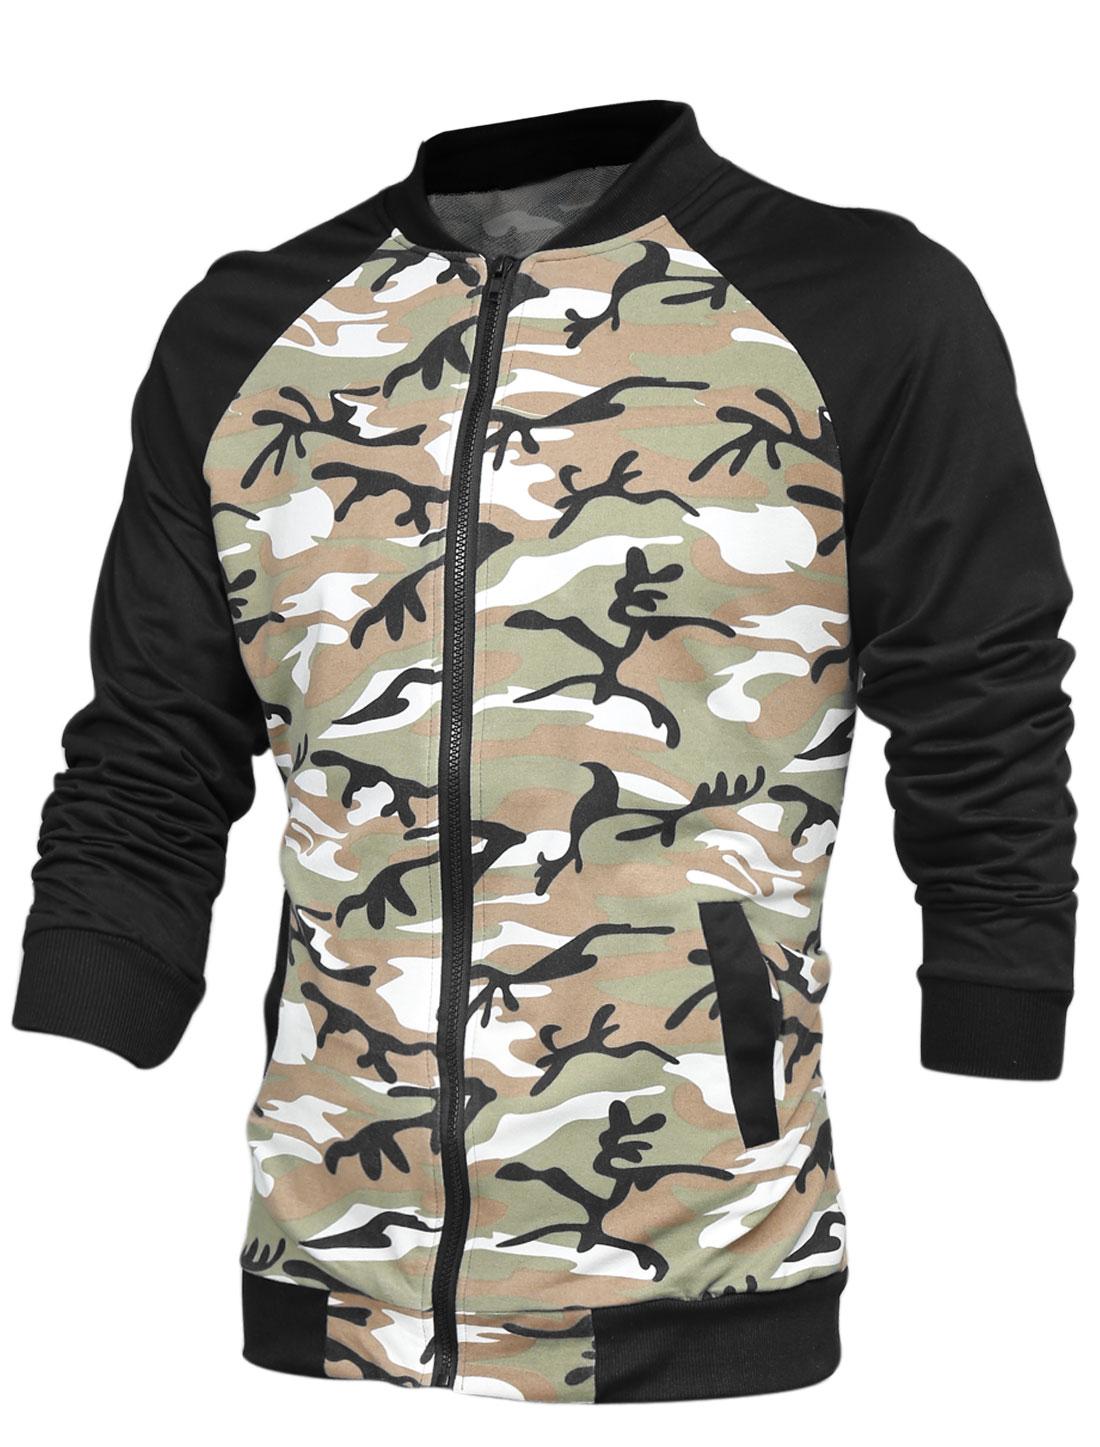 Men Rib Knit Collar Long Raglan Sleeves Camo Print Casual Jacket Brown Army Green M